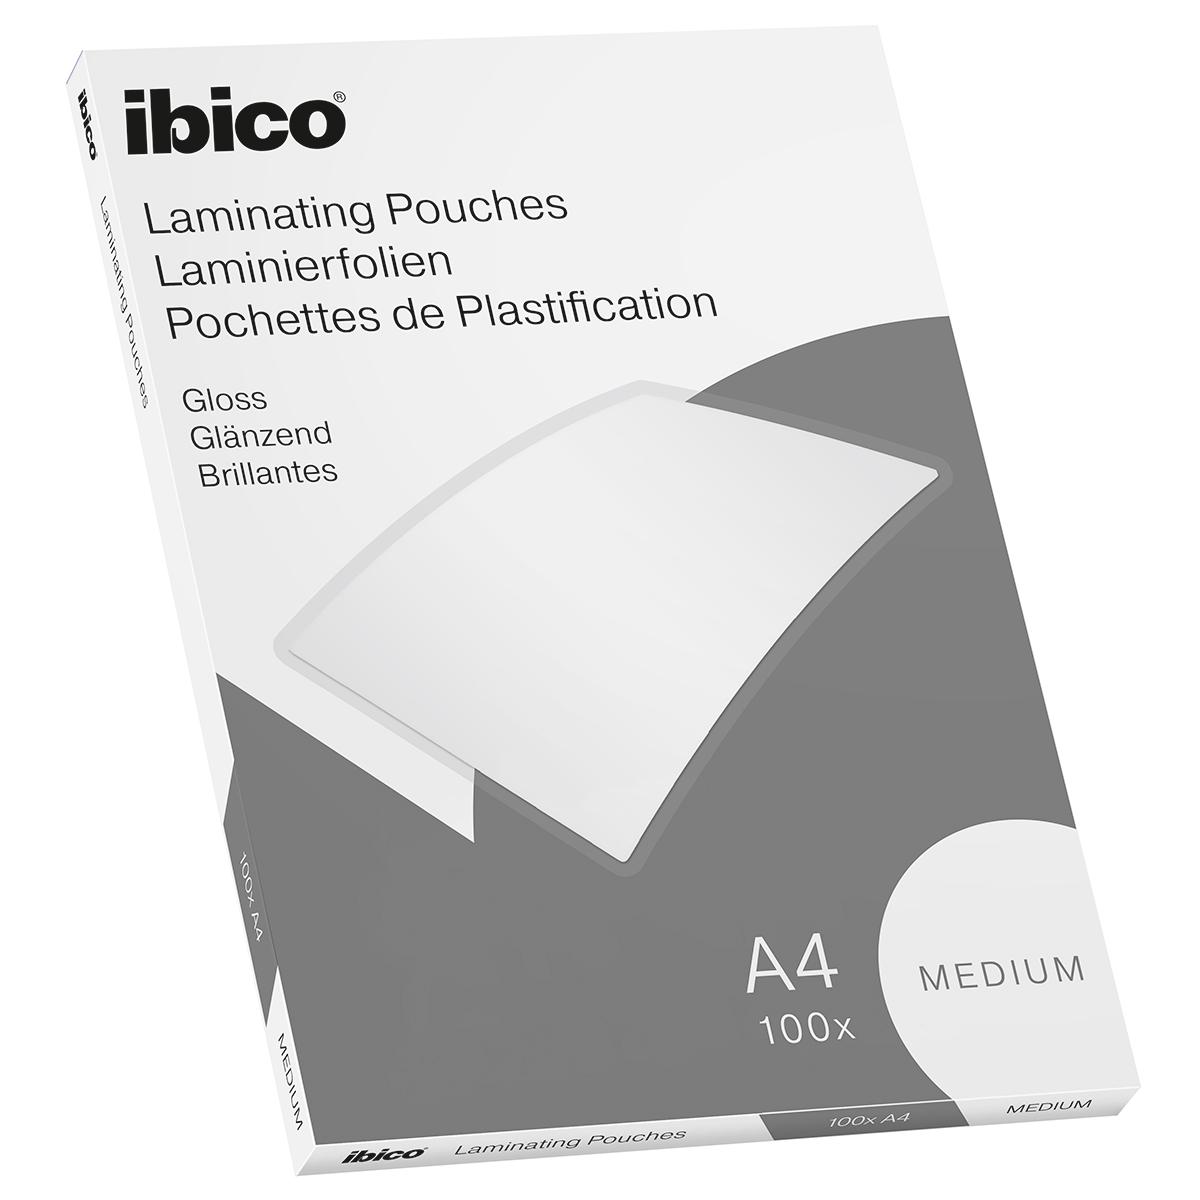 Ibico Basics A4 Gloss Laminating Pouches Medium - Pack of 100